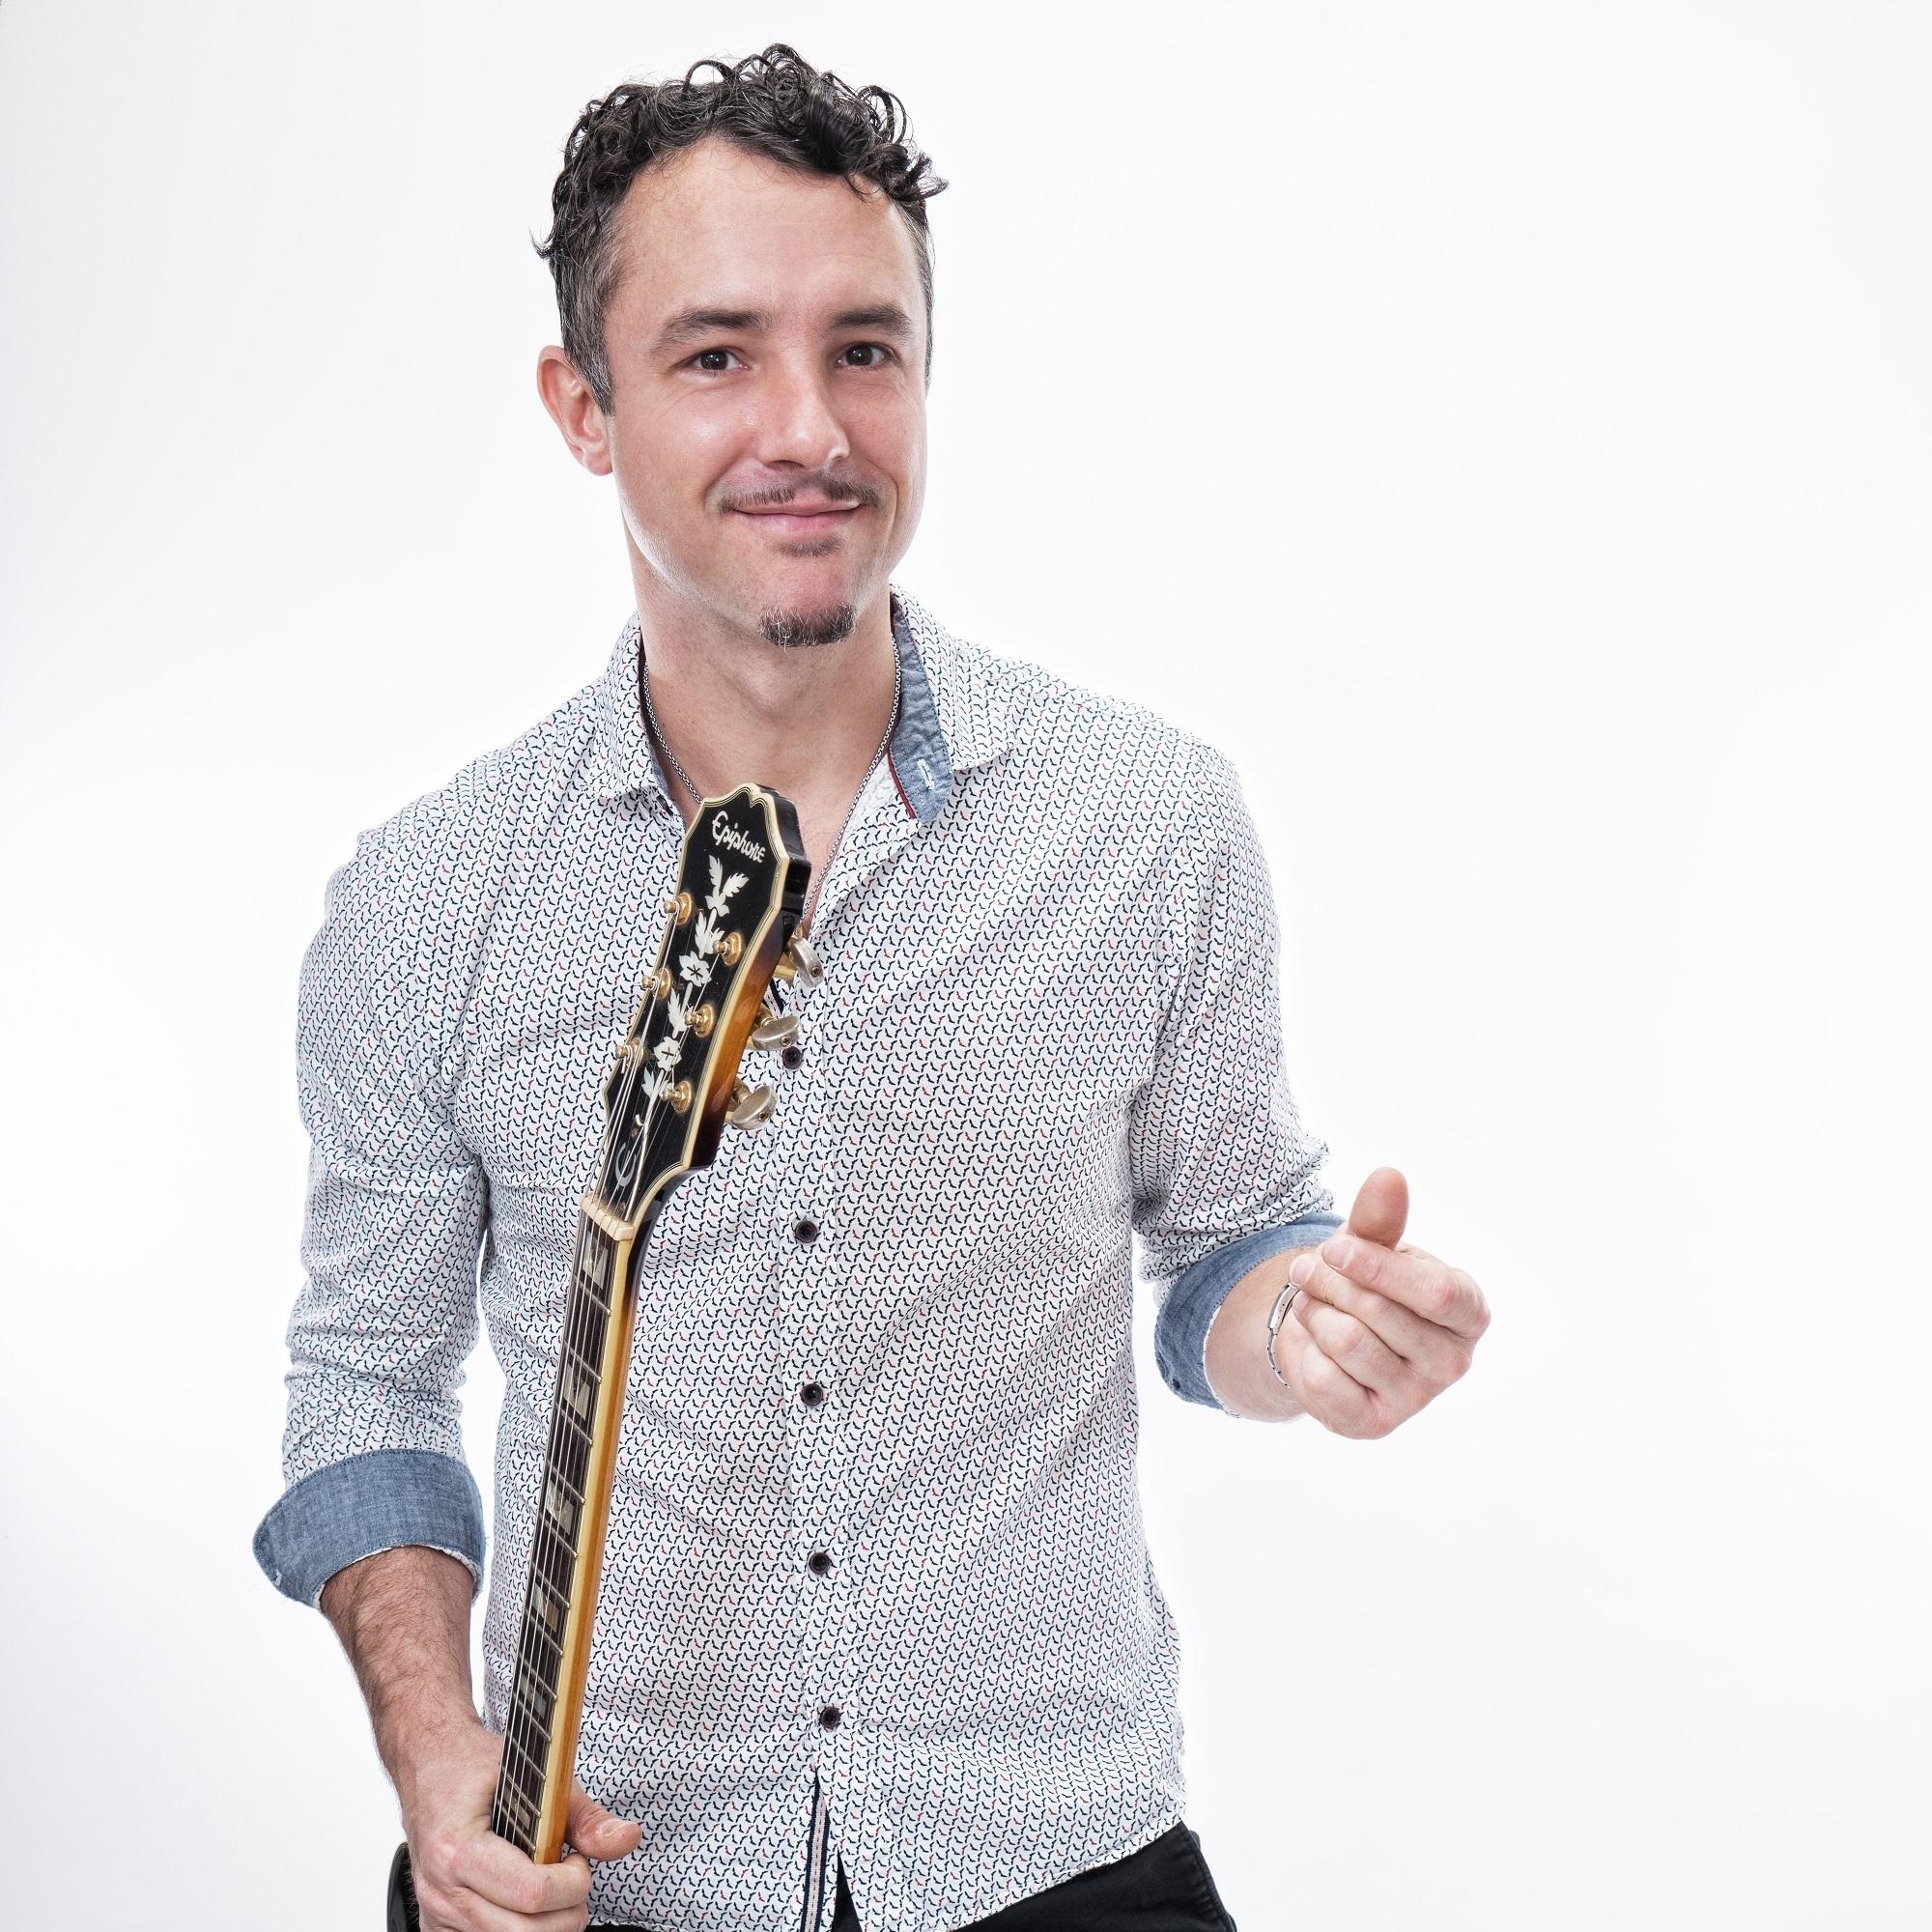 June 15, 2019Gypsy Swing Trio - Time: 2:00 - 4:15 PMGypsy Swing Trio 樂隊主腦安東尼來自法國南特,他的曲目從爵士樂和吉普賽人的經典作品到愛迪·琵雅芙的傳統法國曲調..... 他將帶來一個微妙的法式吉普賽弦音!